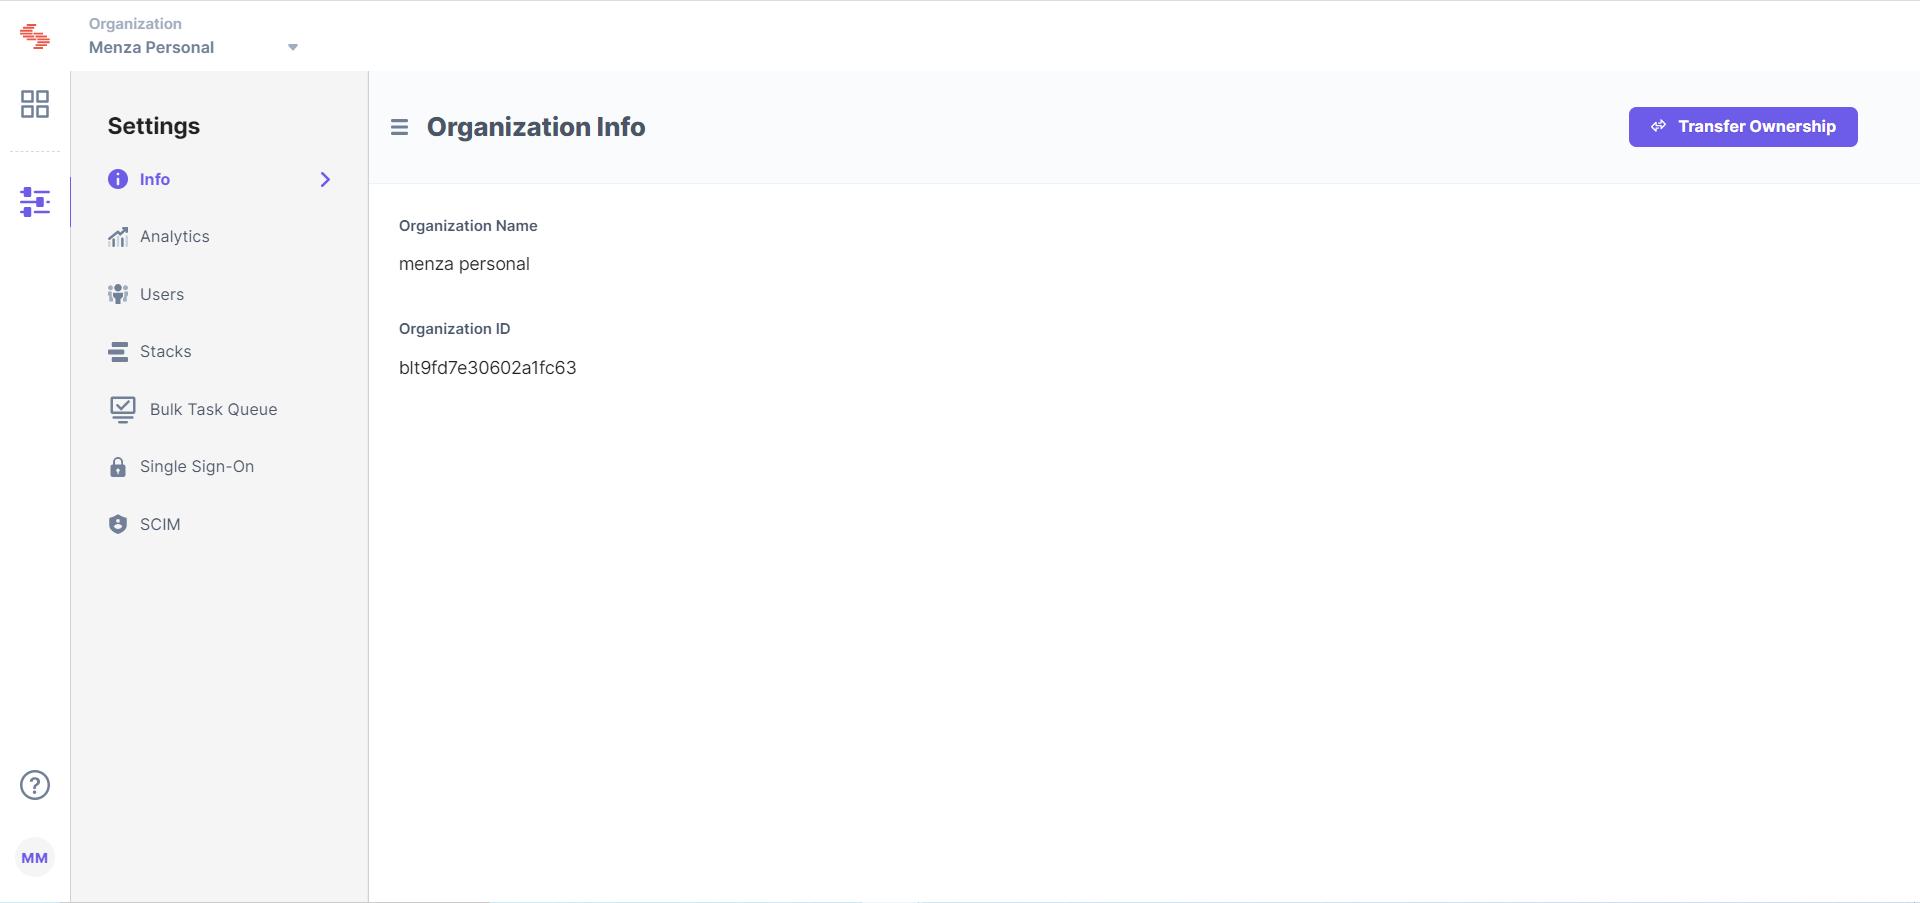 Organization_FAQs_2_no_highlight.png